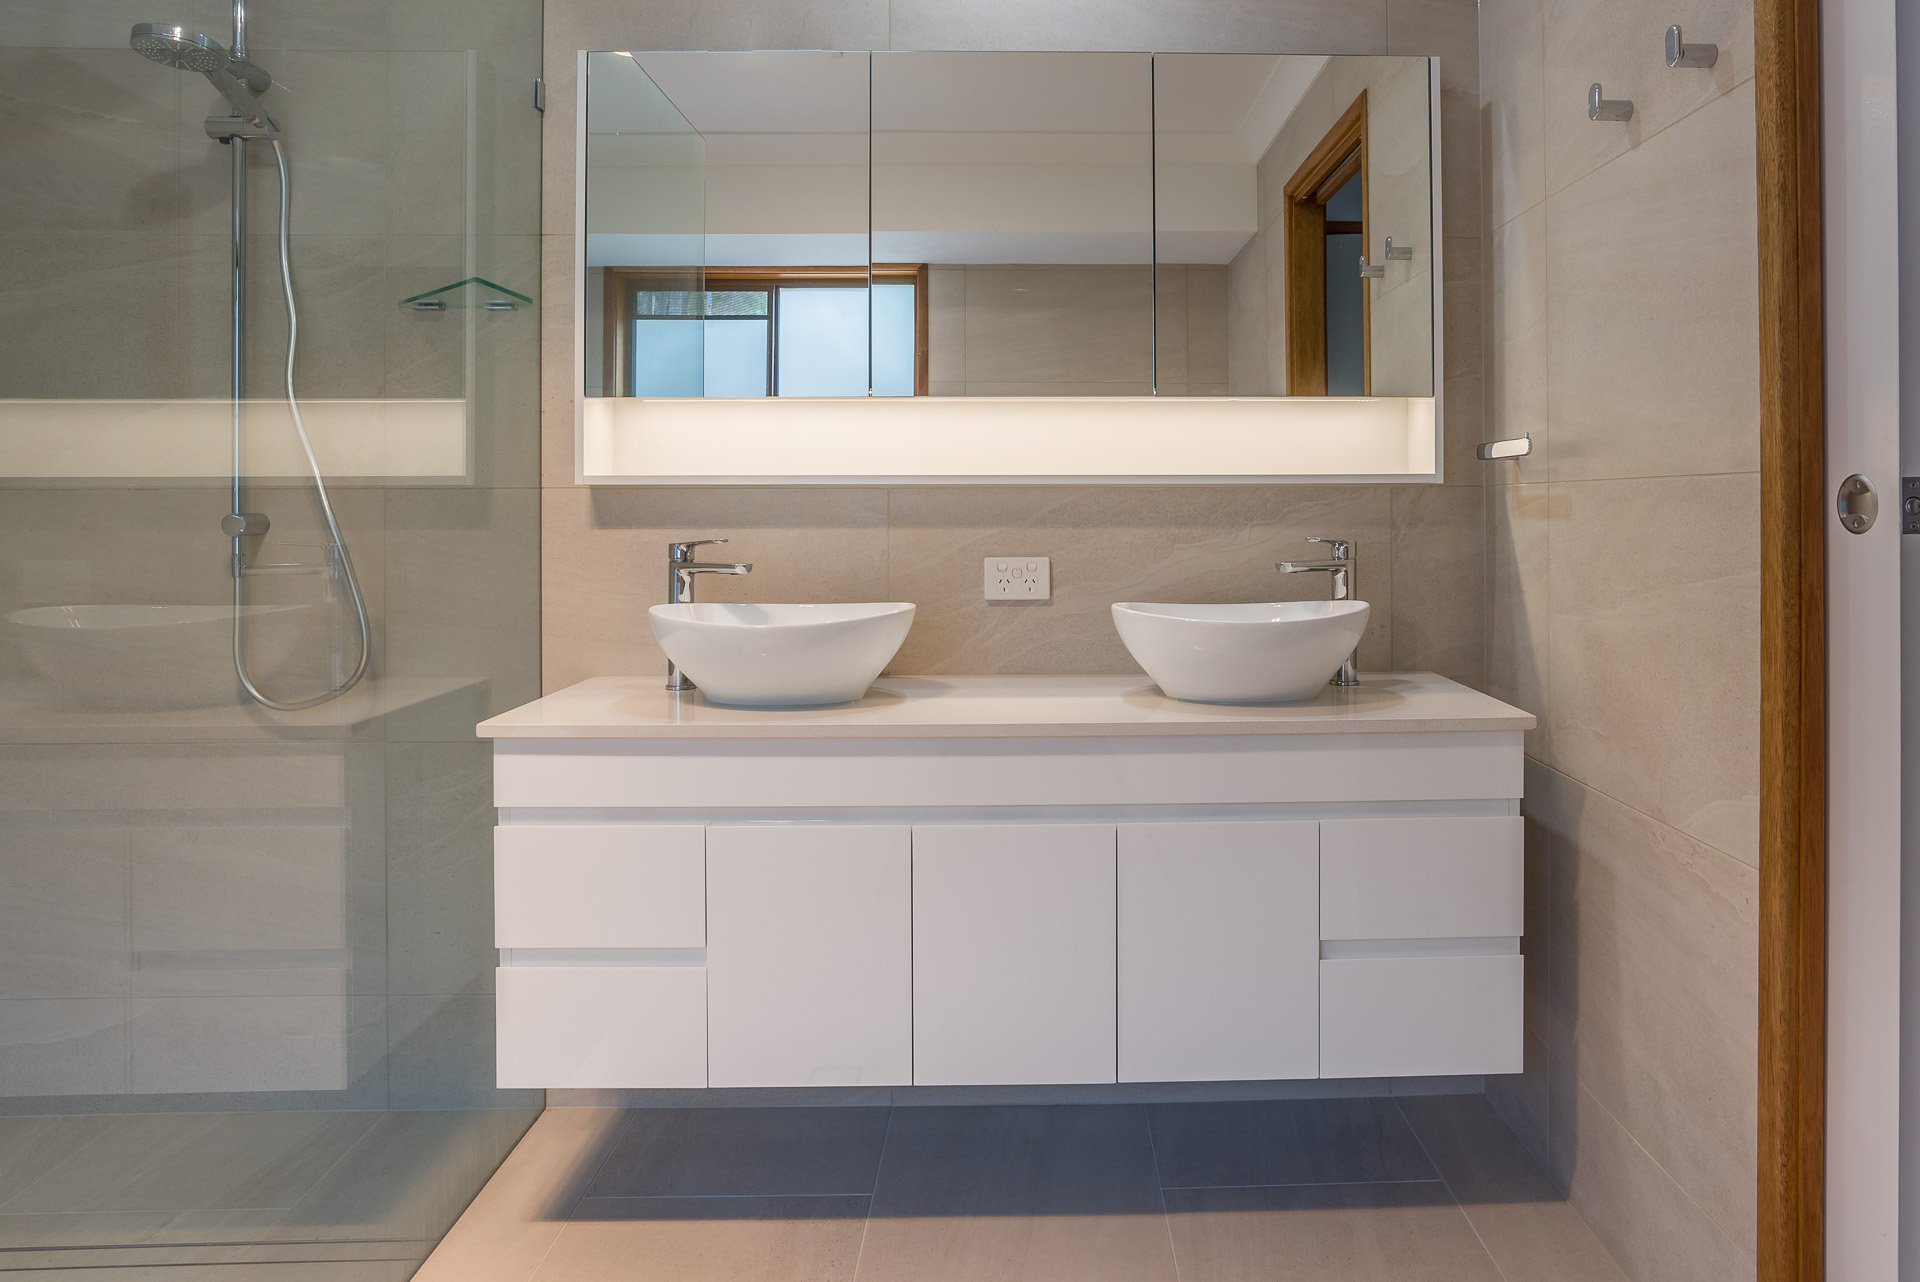 river city constructions dual sink bathroom renovation